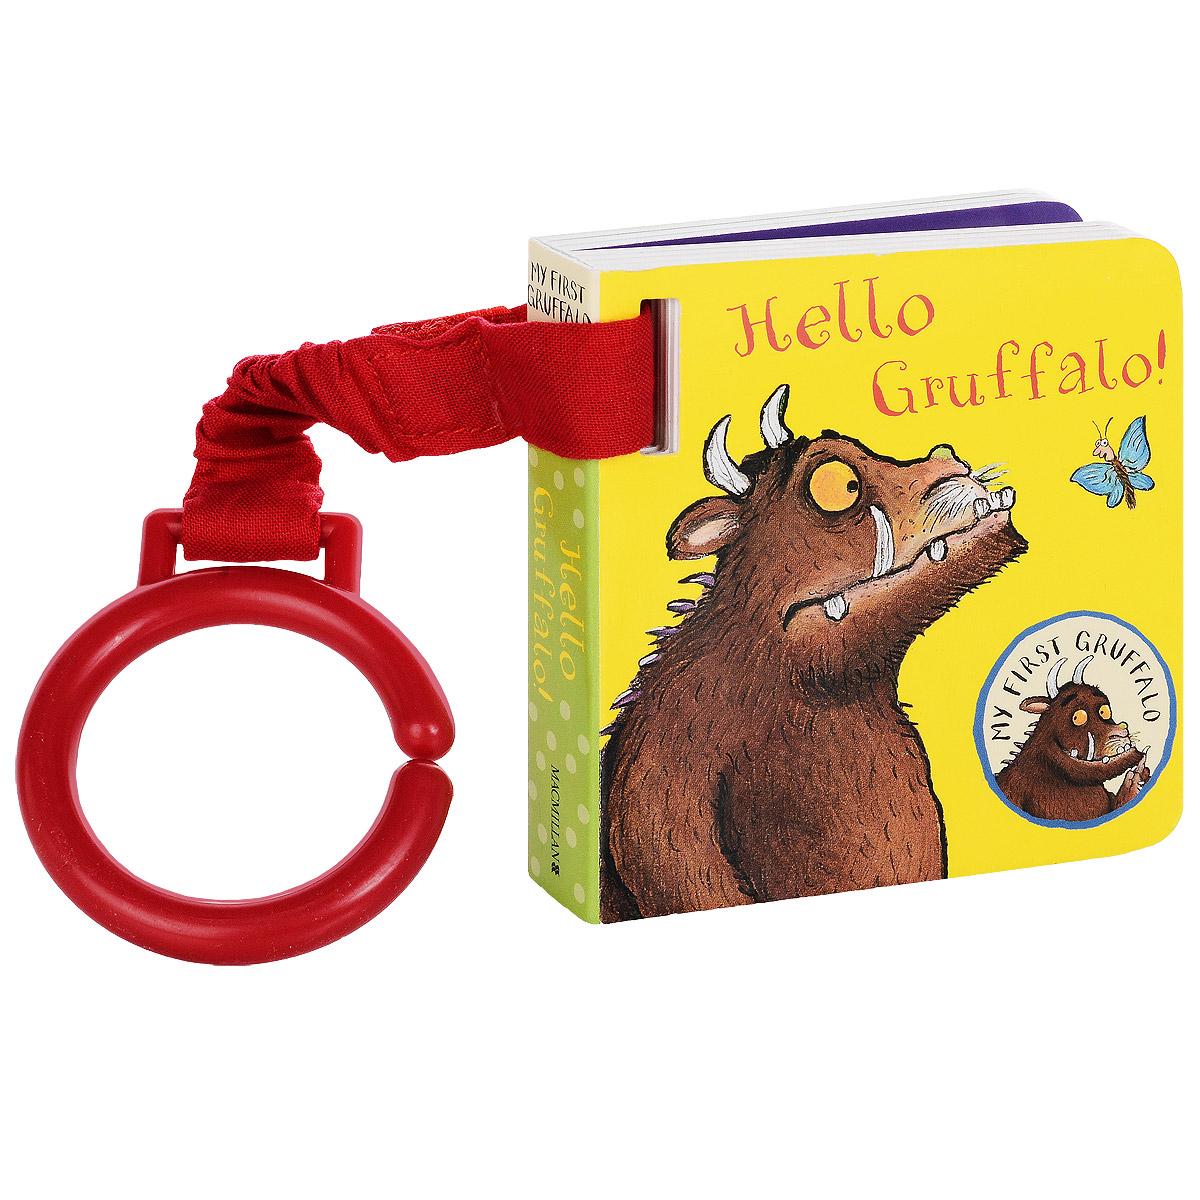 Hello Gruffalo!